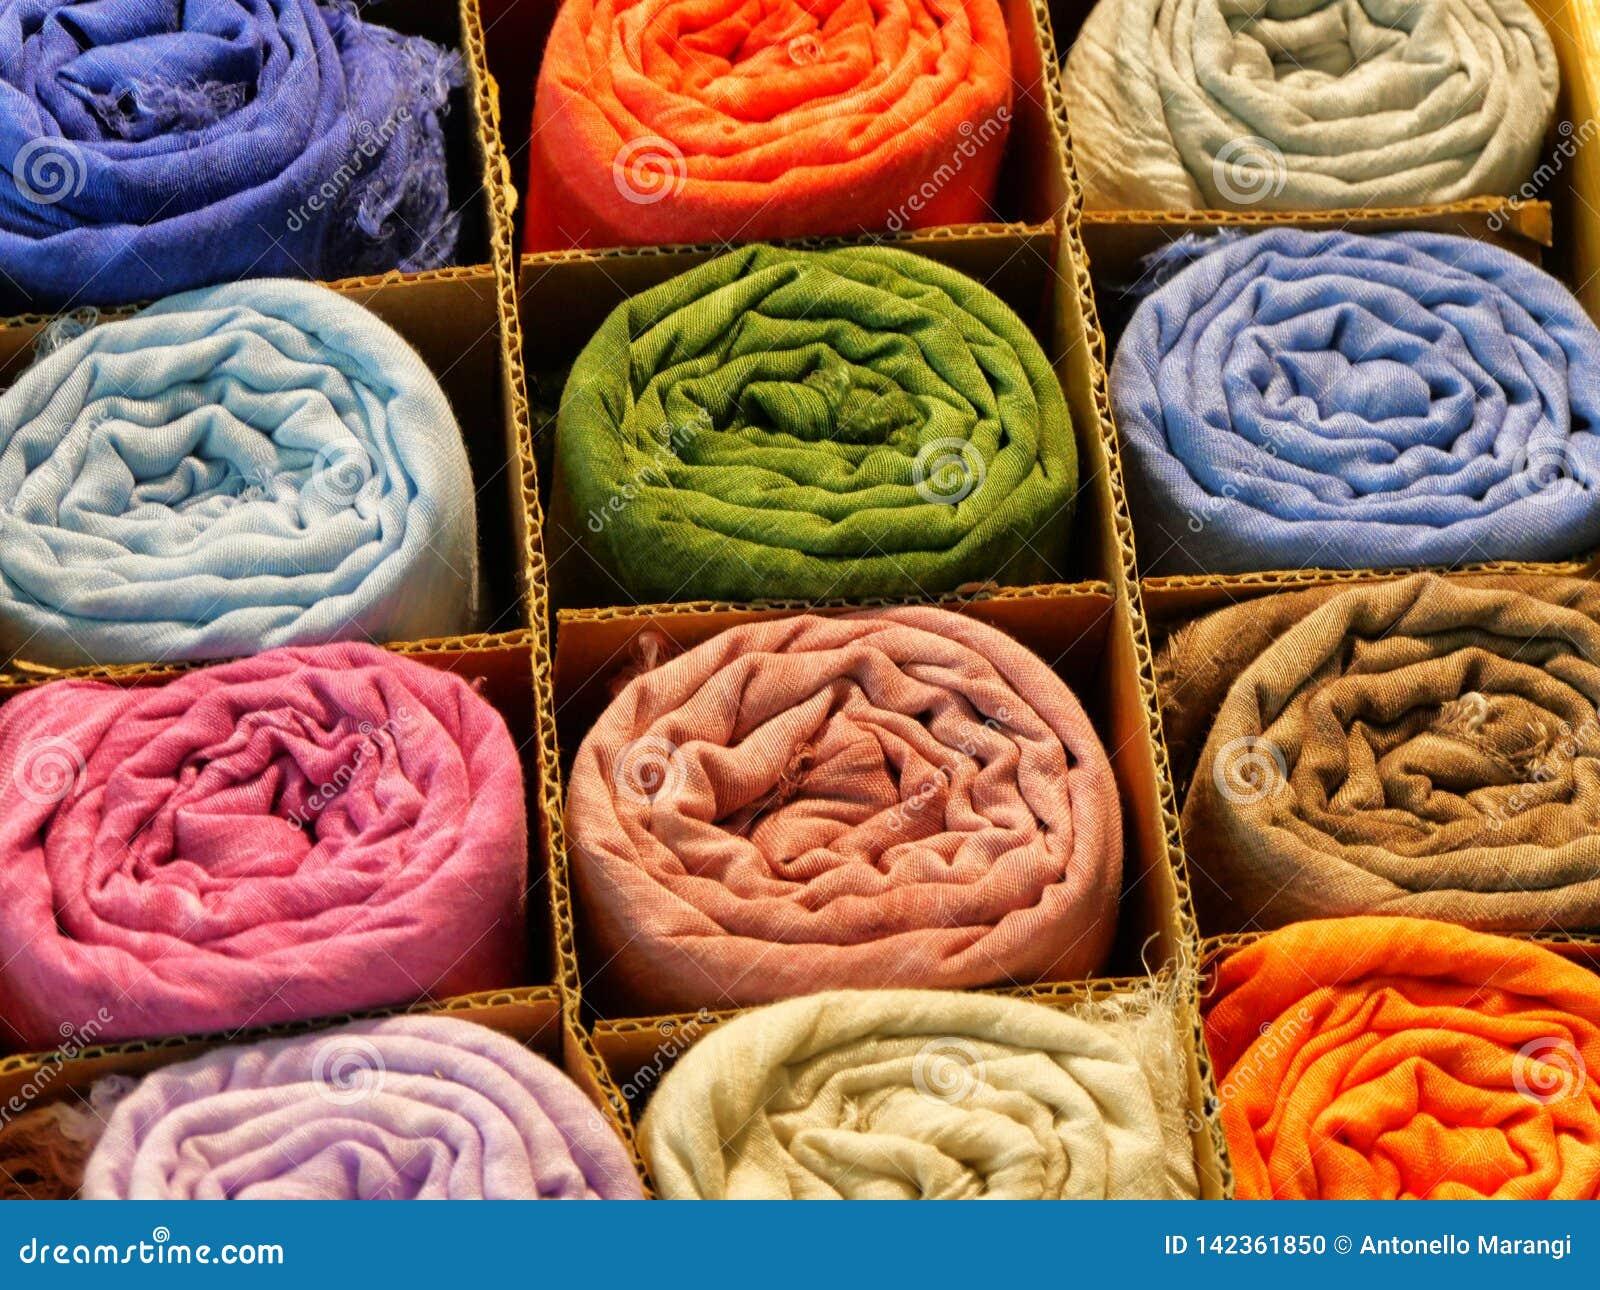 Variedade de scarves de seda rolados de cores vívidas diferentes